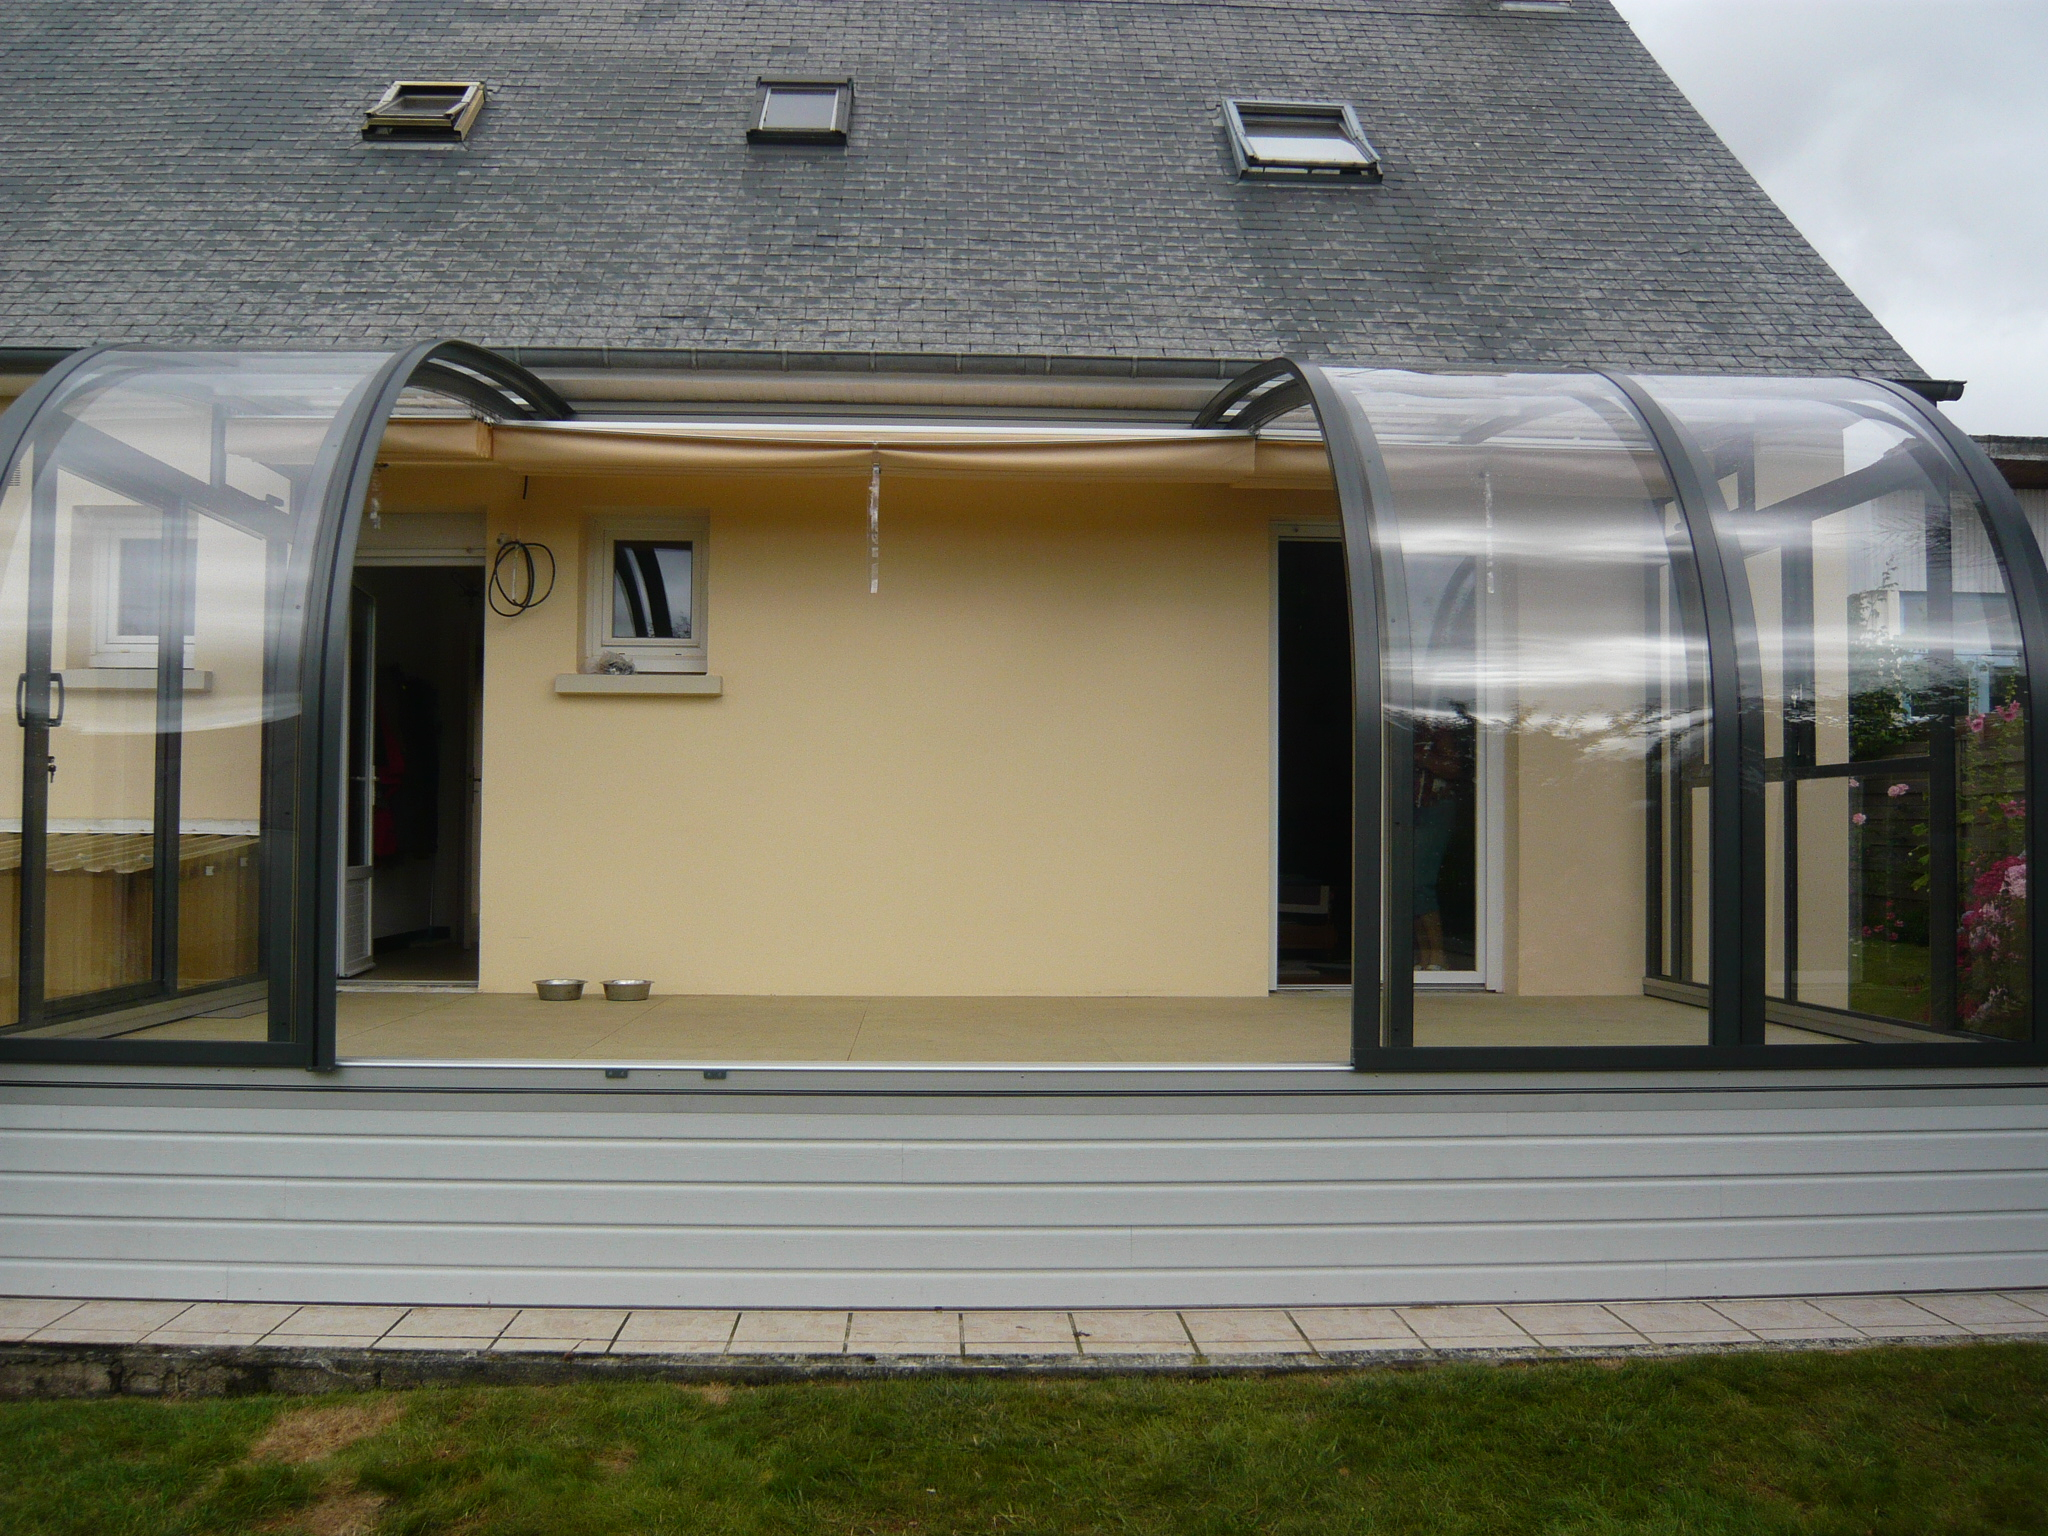 Gamme Saphir - Abri-T - Terrasse, Piscine, Spa, Voiture pour Abri De Terrasse Ferme